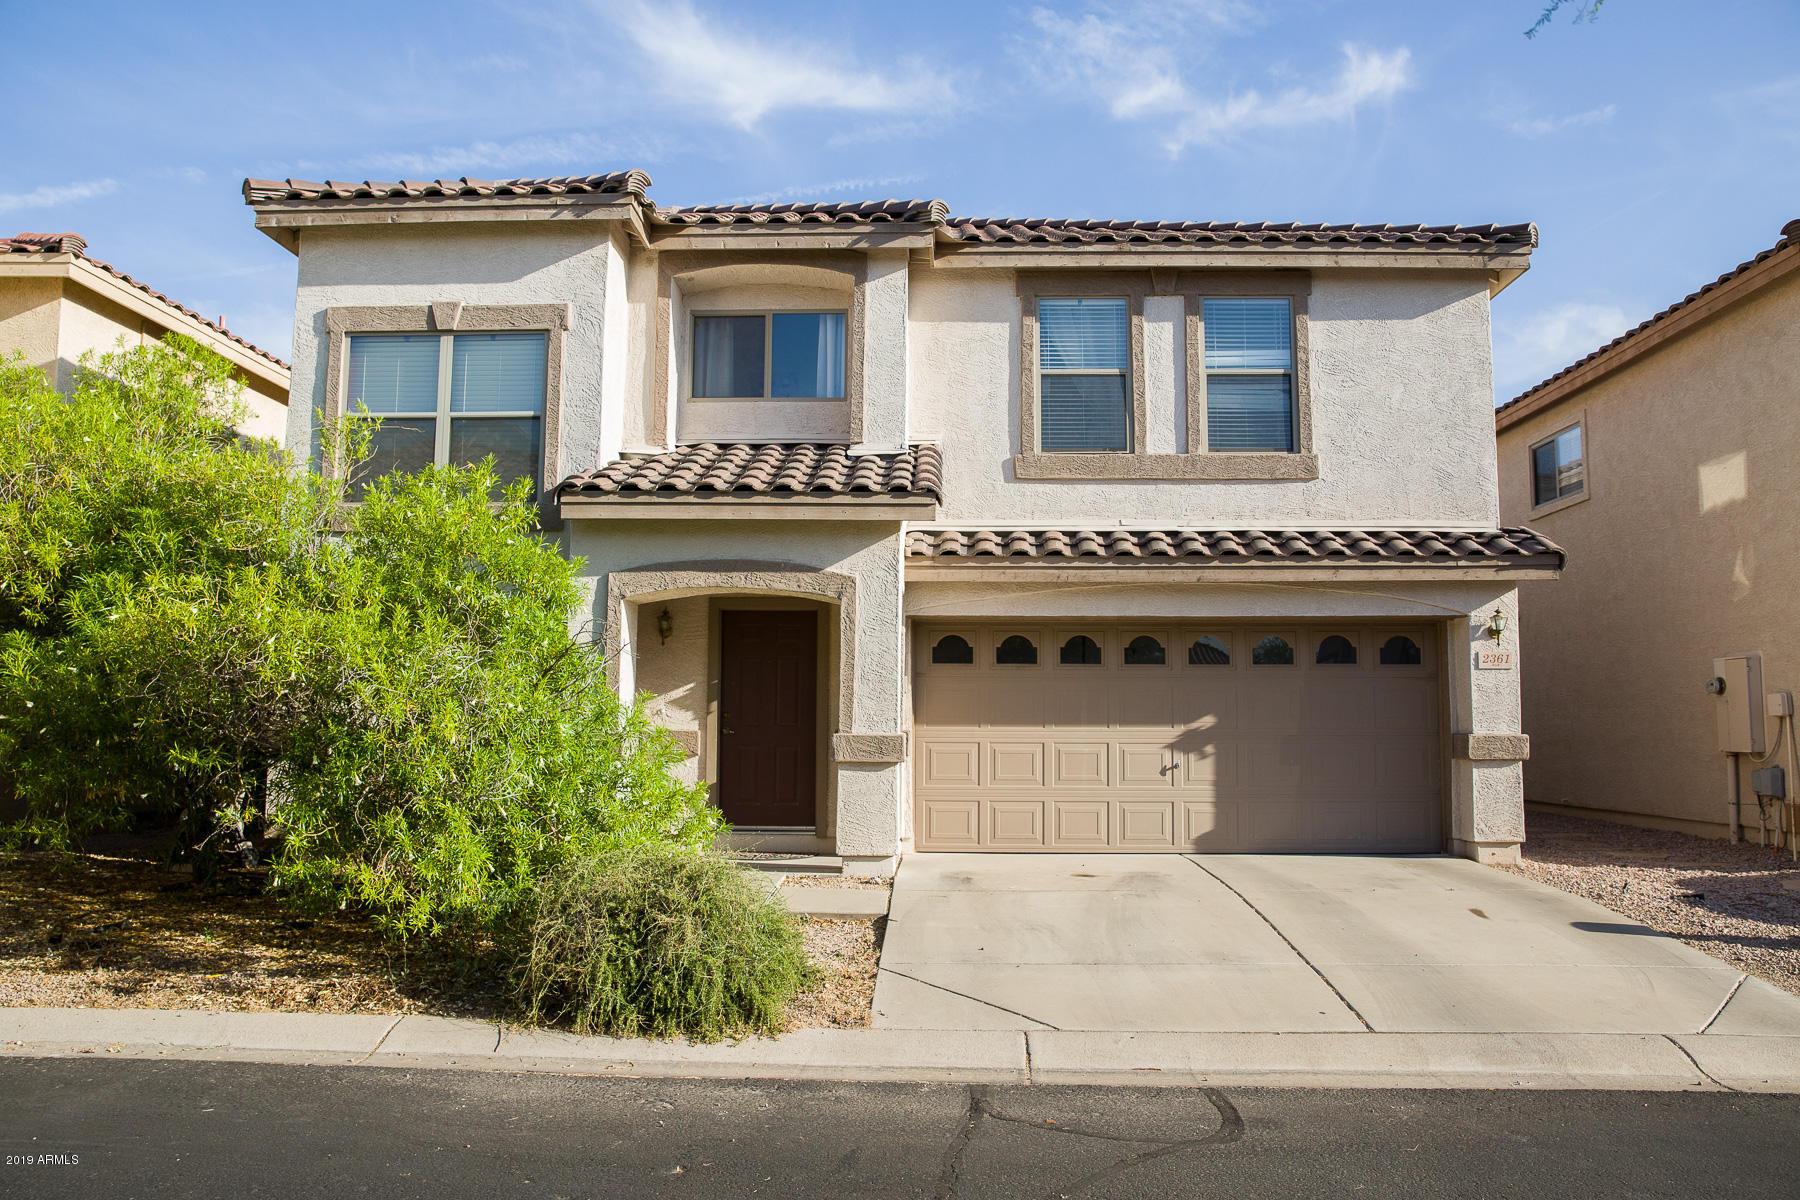 Photo of 2361 E 35TH Avenue, Apache Junction, AZ 85119